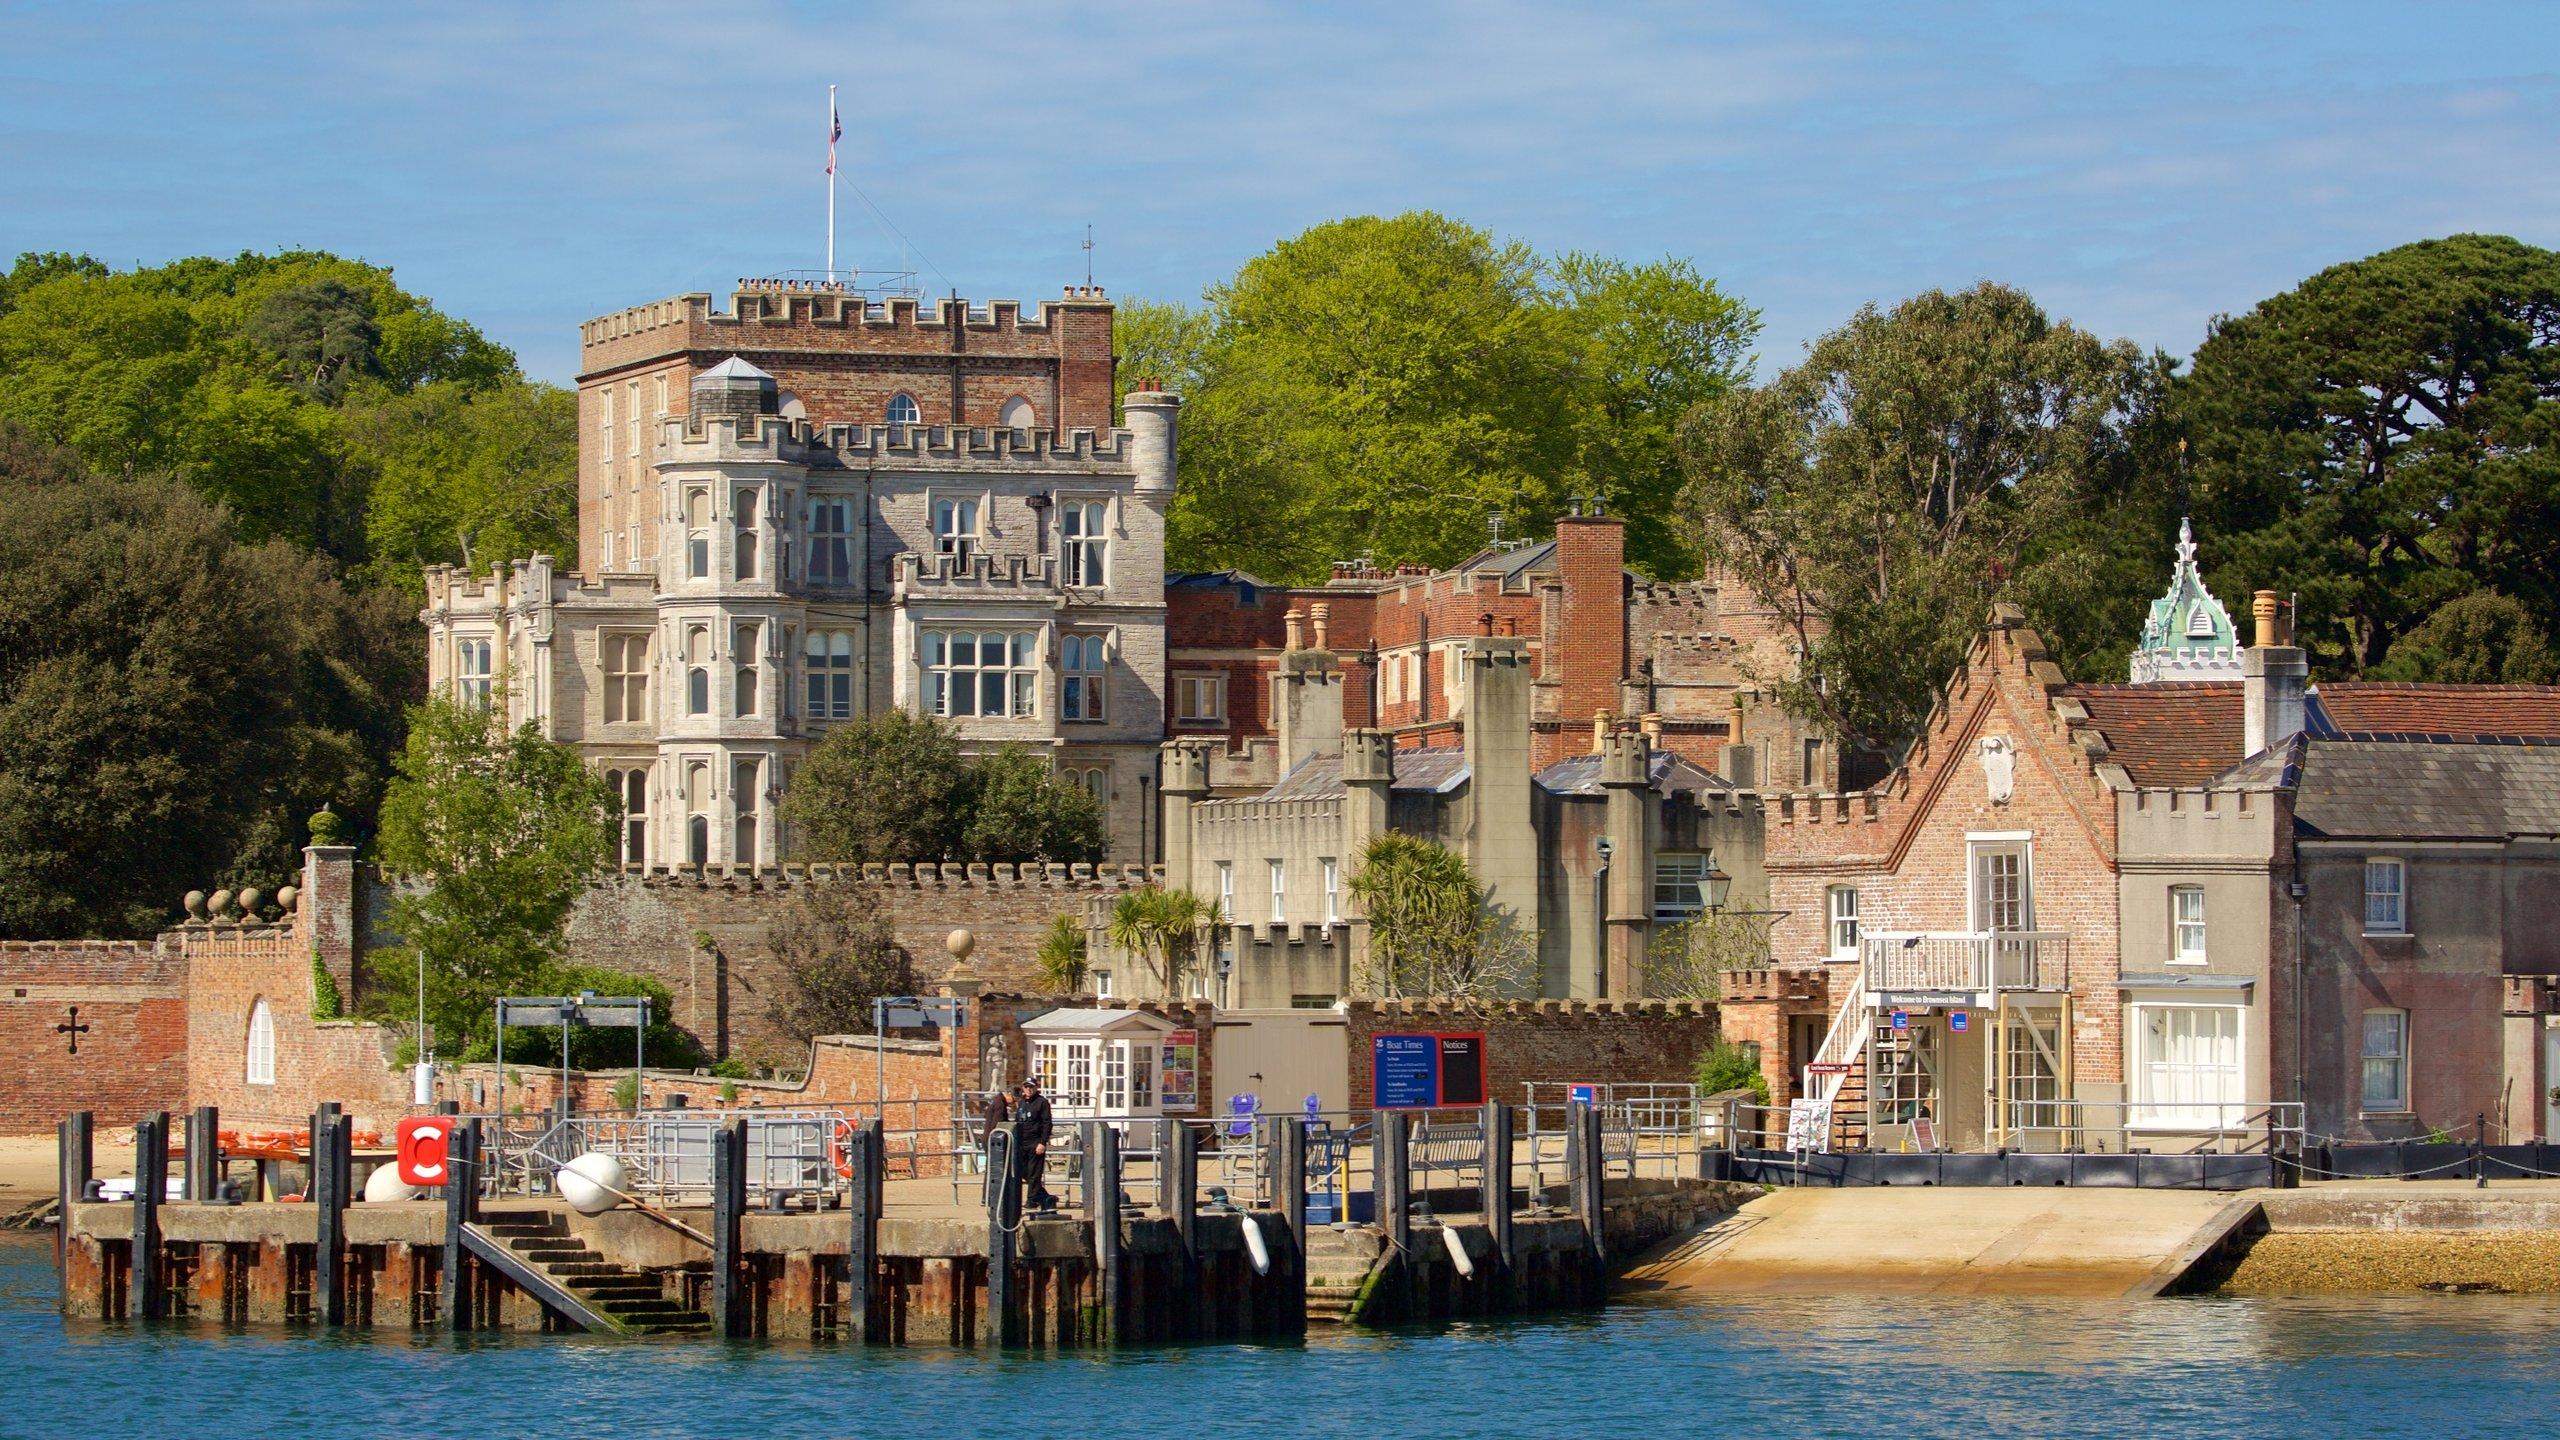 Poole, England, United Kingdom